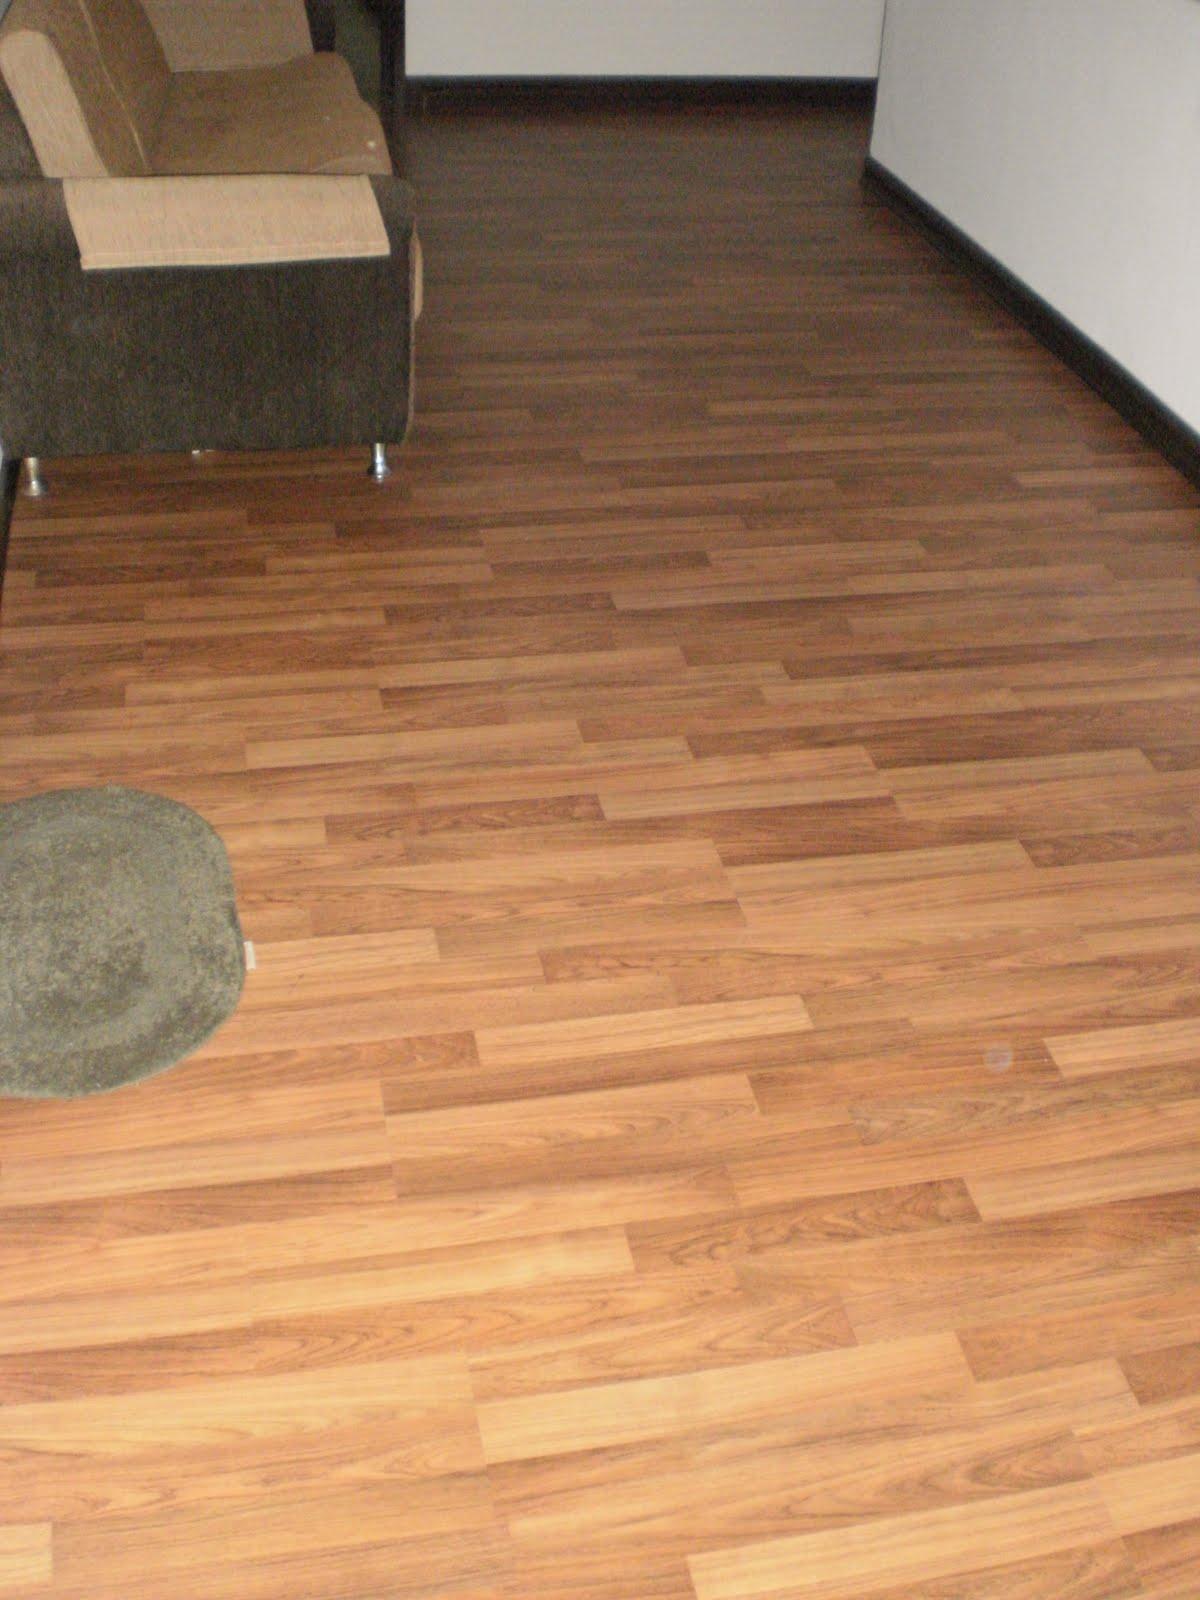 Laminate flooring best laminate flooring hall for Best laminate flooring